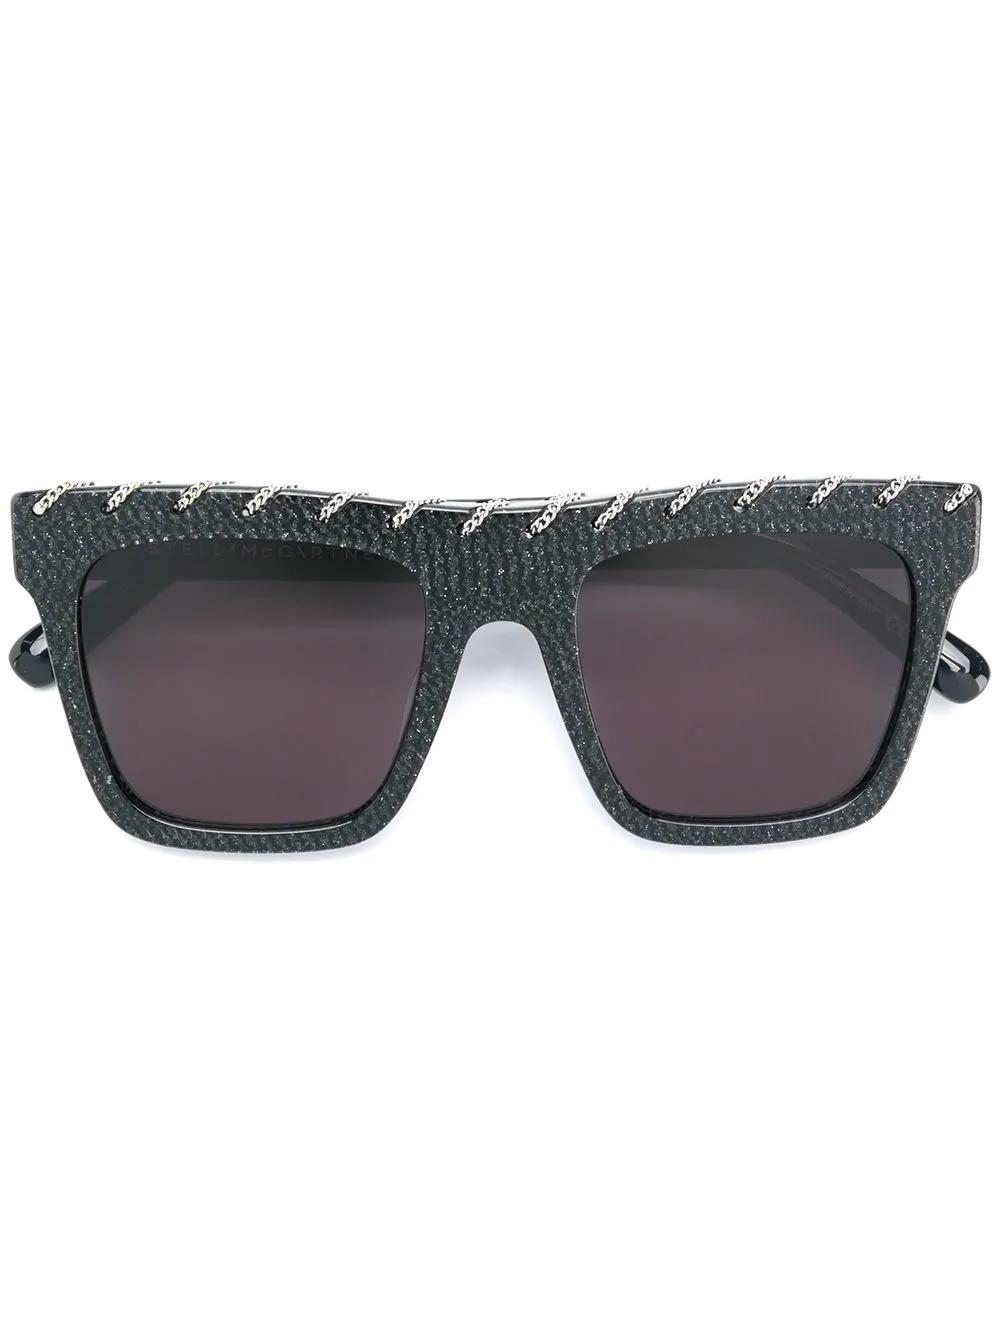 df9f7faf1403 Stella Mccartney Eyewear Square Chain Sunglasses - Black